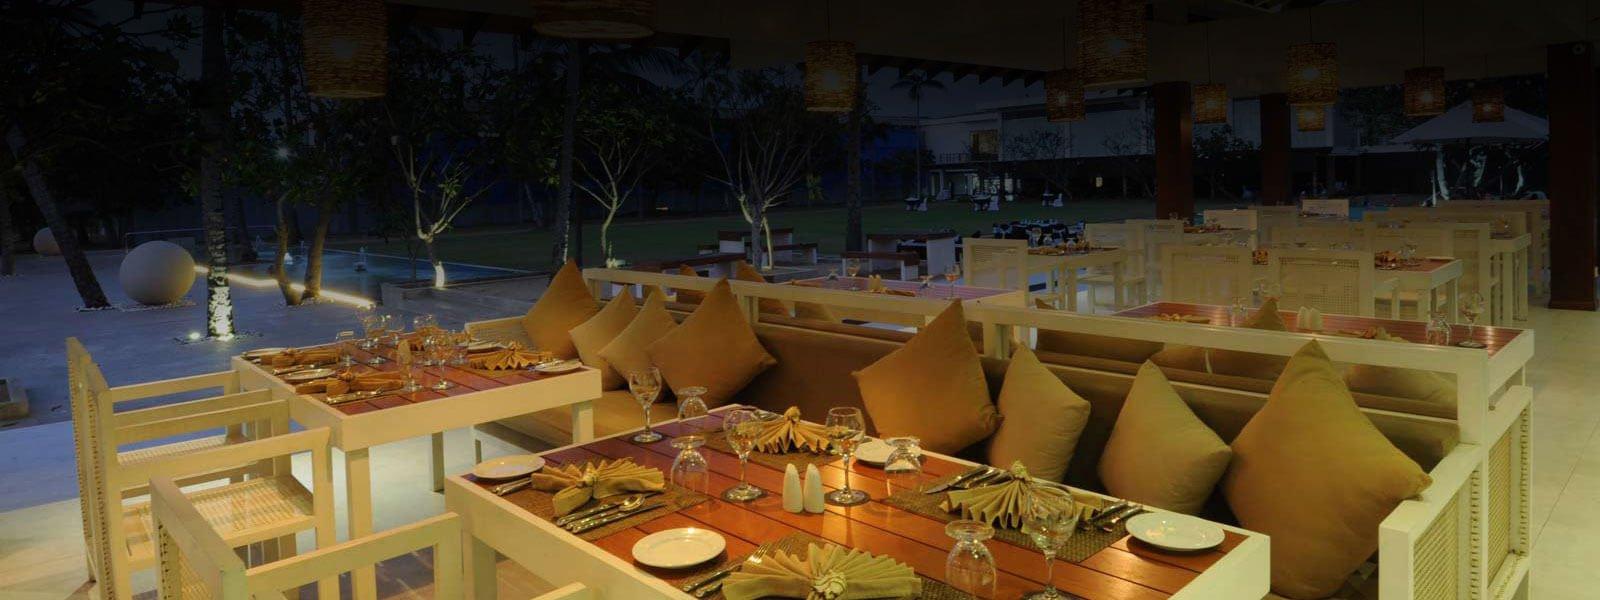 Hotel Pegasus Reef, Wattala (Open Air Restaurant & Seafood Dining)